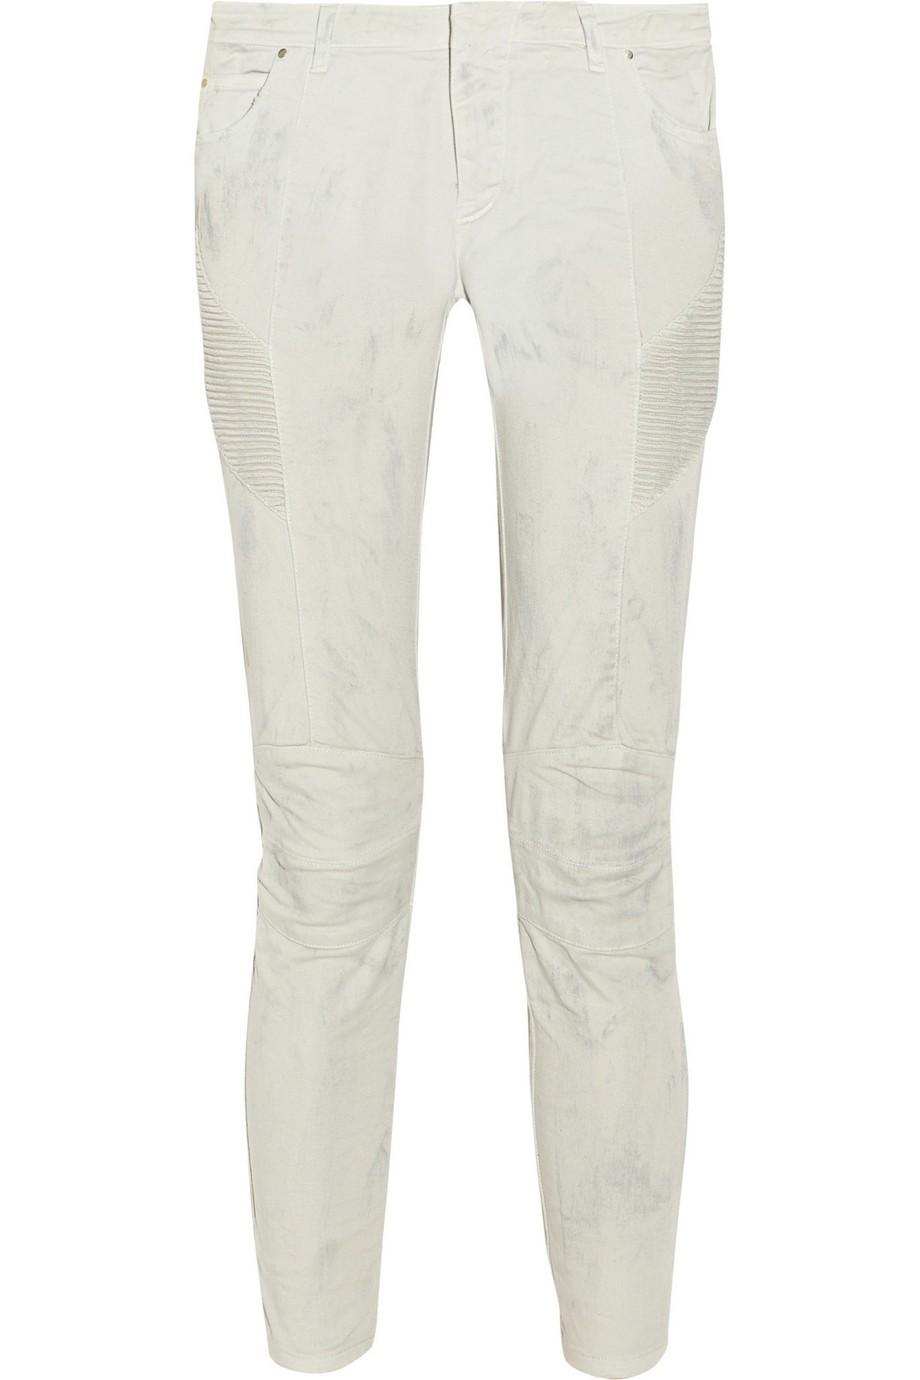 Printed mid-rise skinny jeans